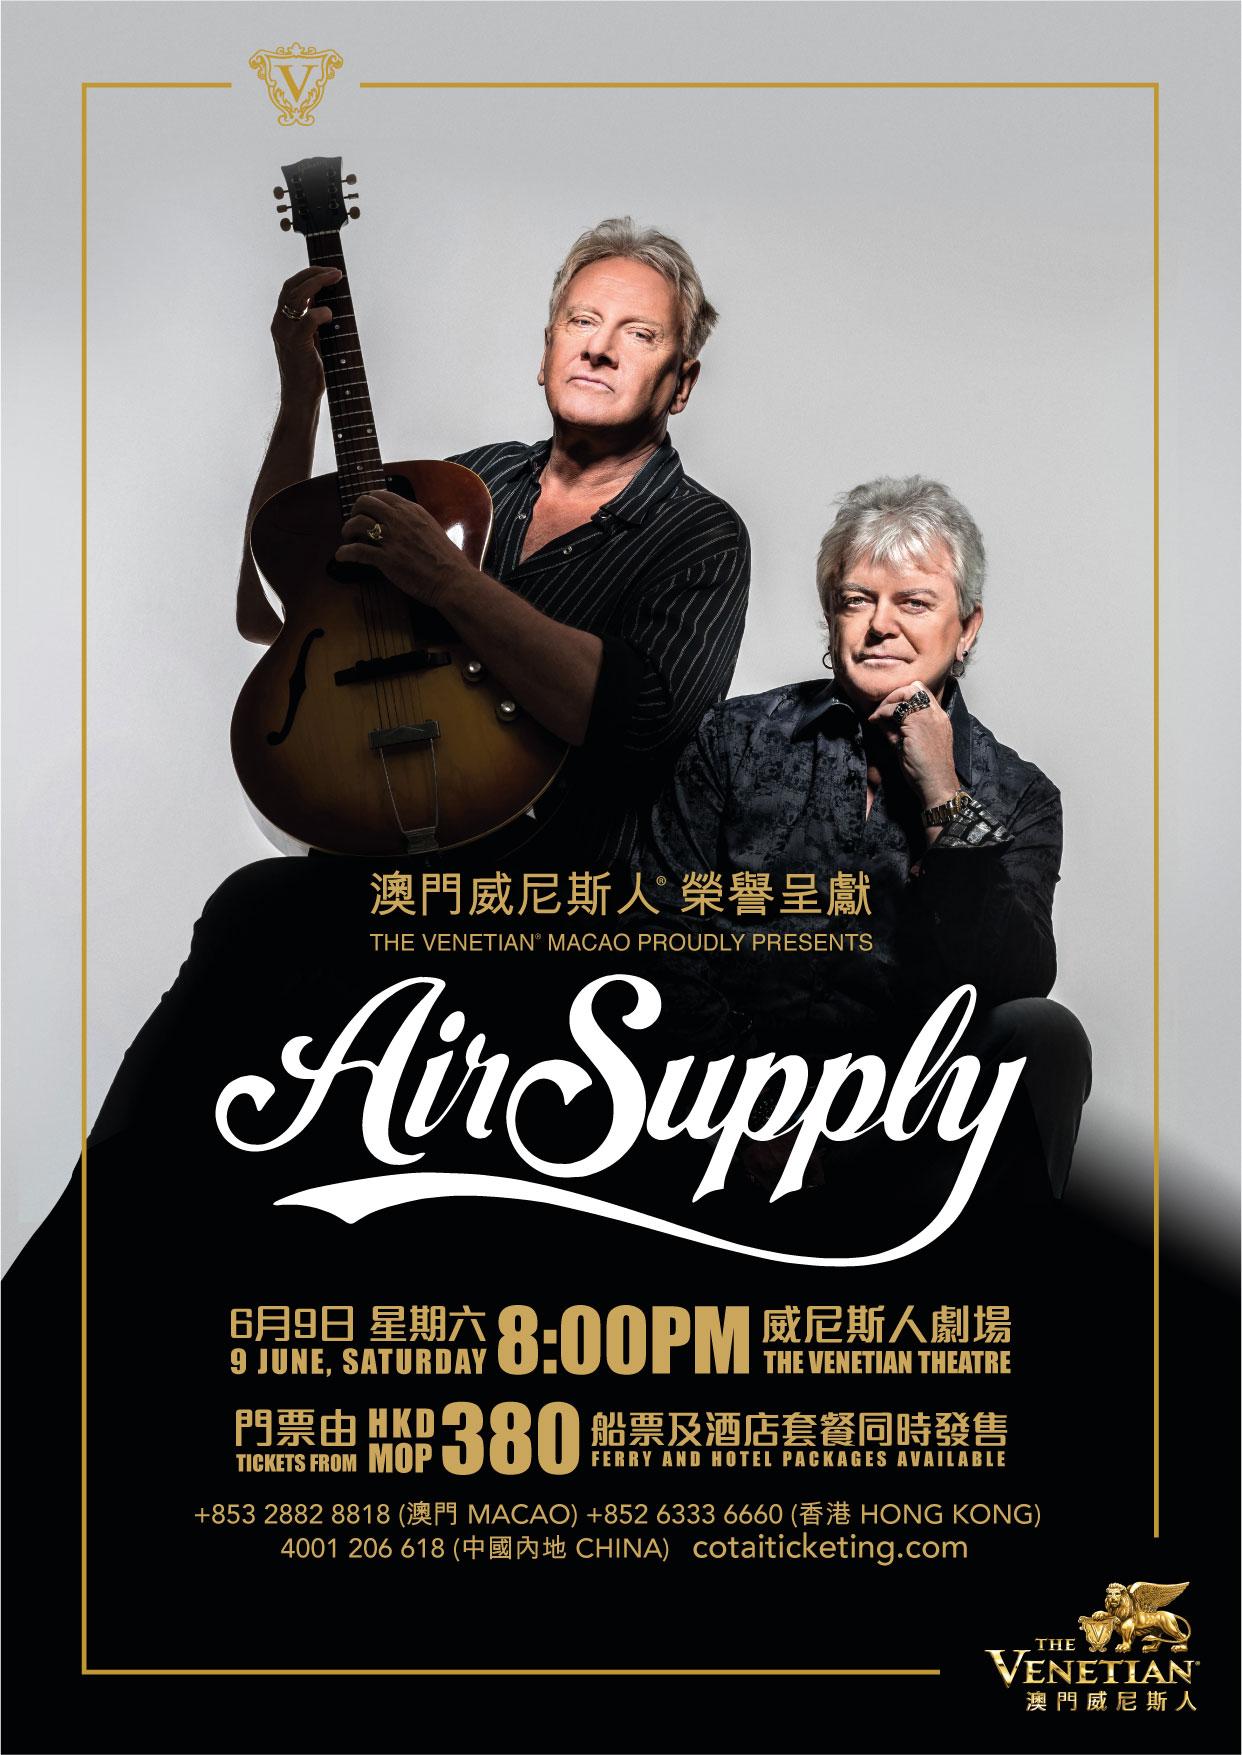 《Air Supply Live in Concert 2018 - Macao》-澳门威尼斯人 威尼斯人剧场